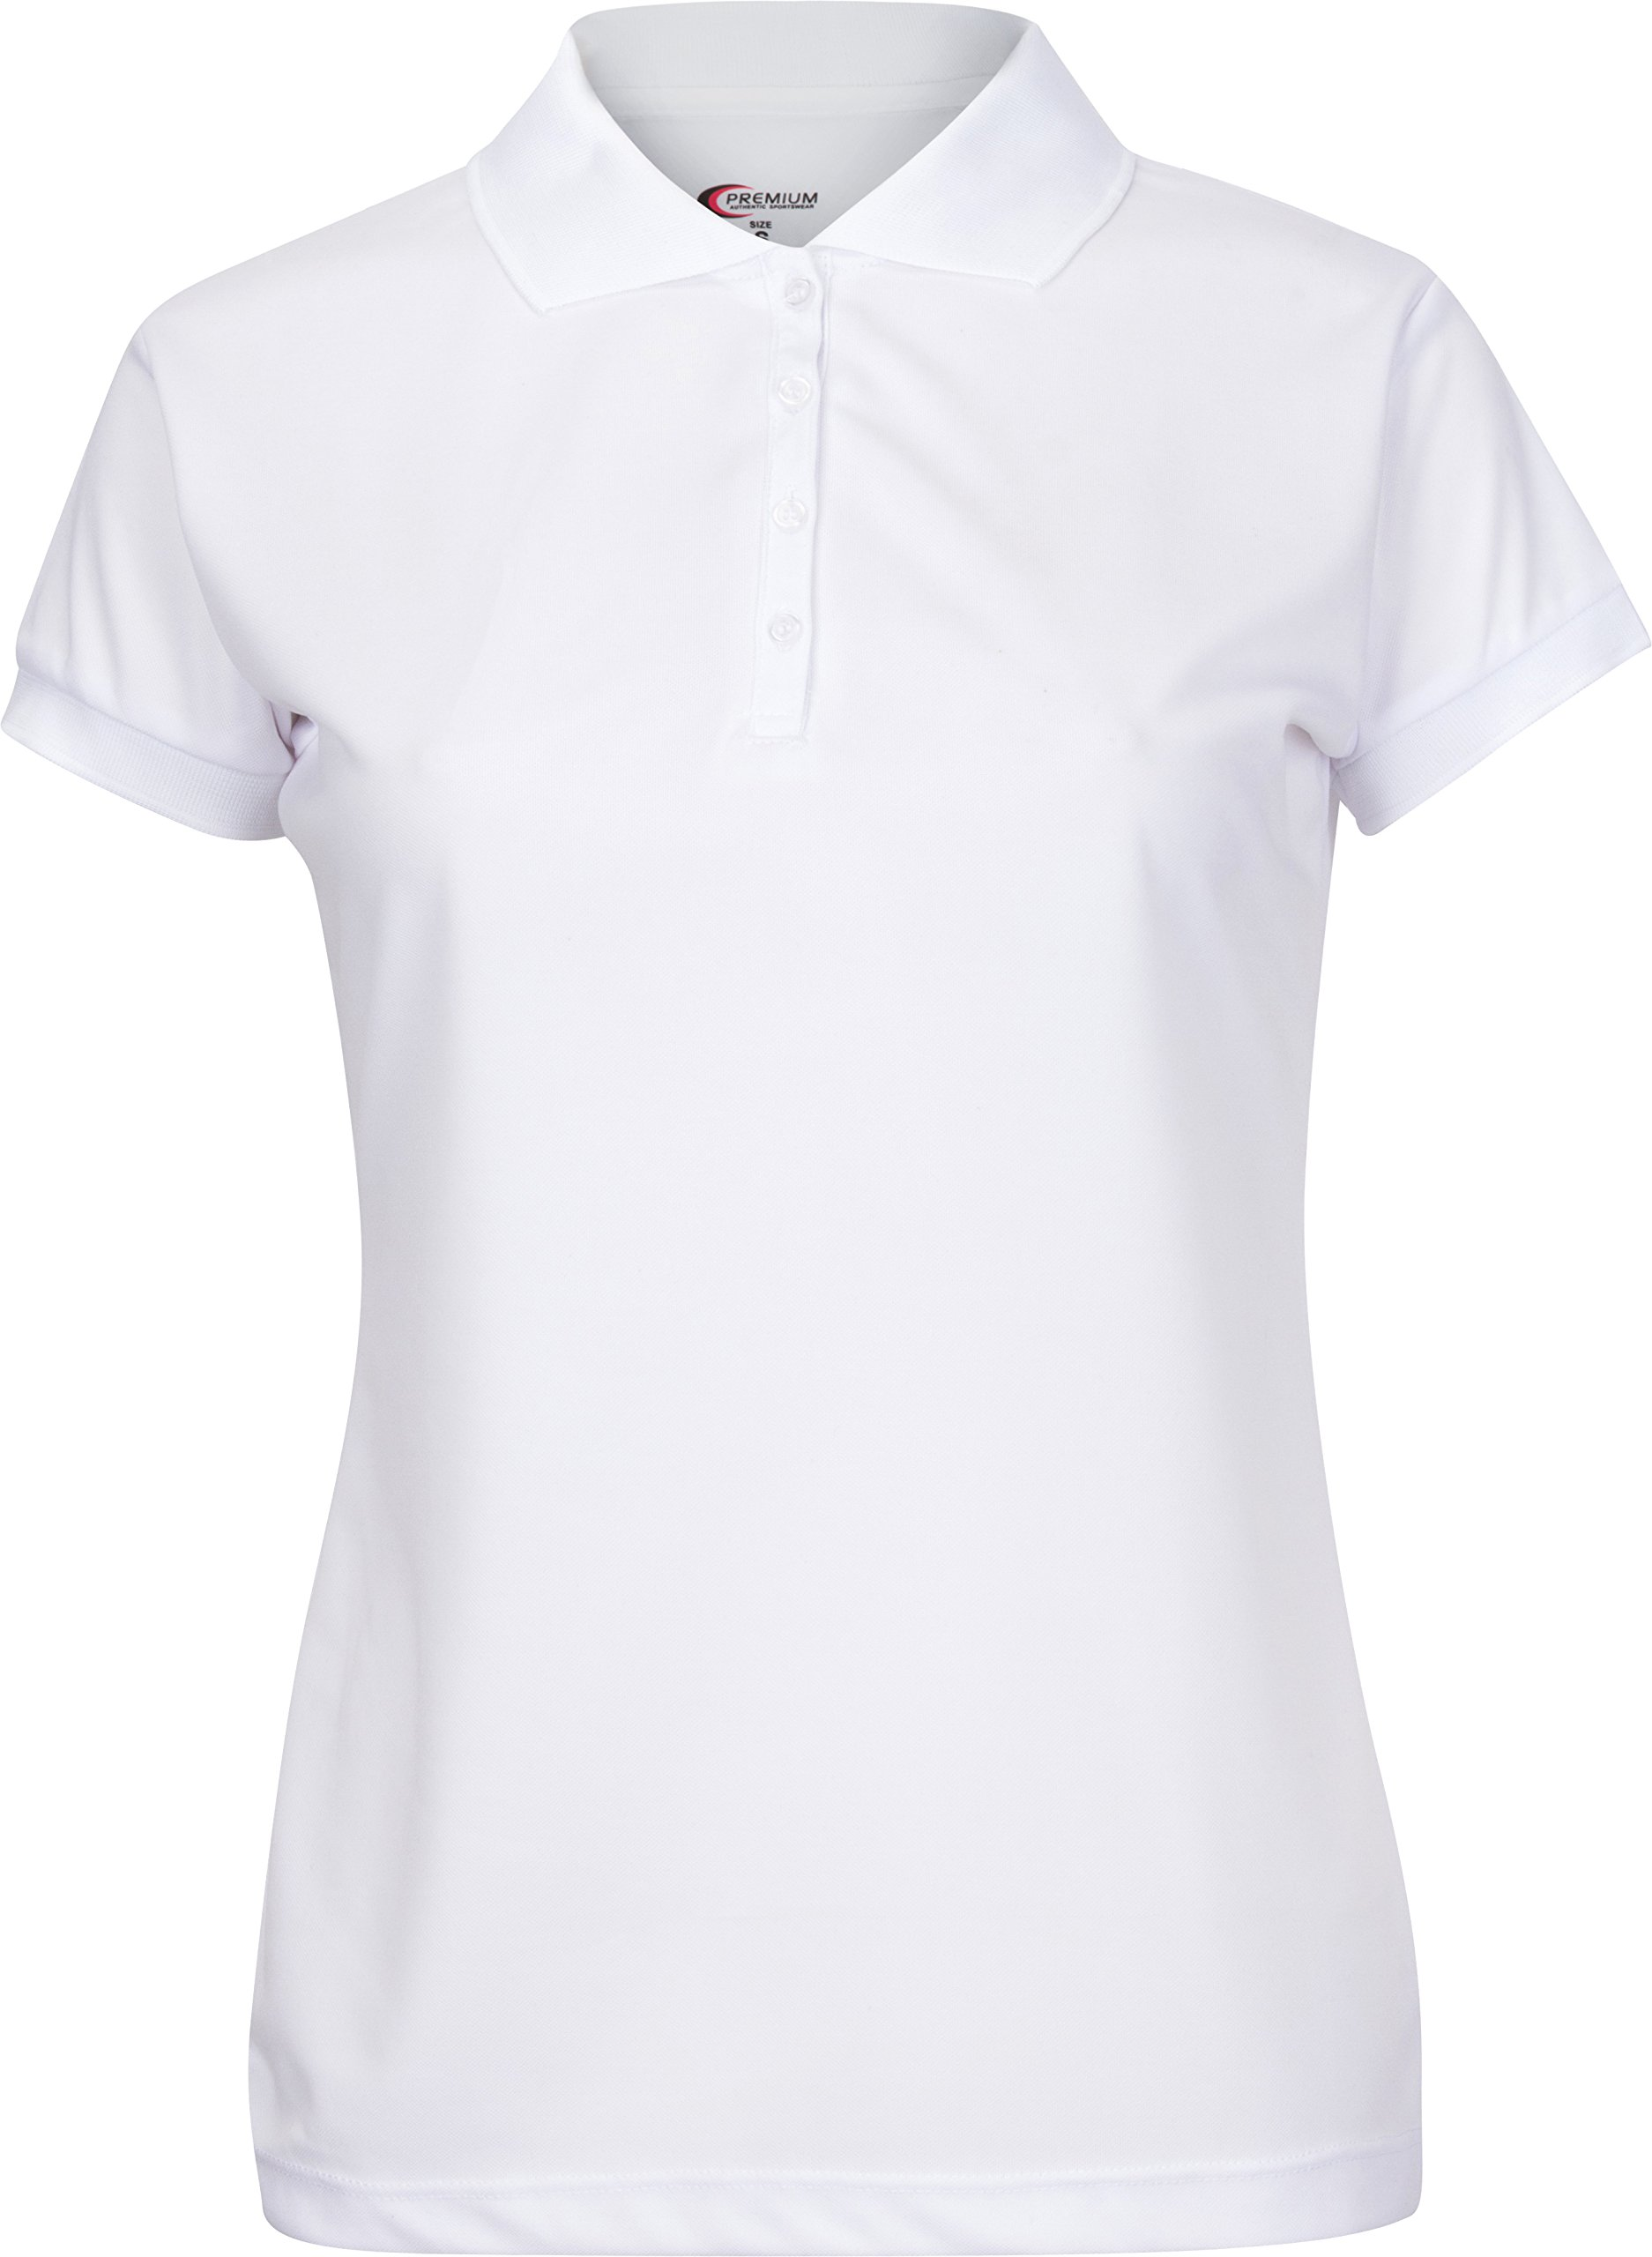 Premium Polo T-Shirt For Junior Girls – High-Performance Moisture Wicking Fabric